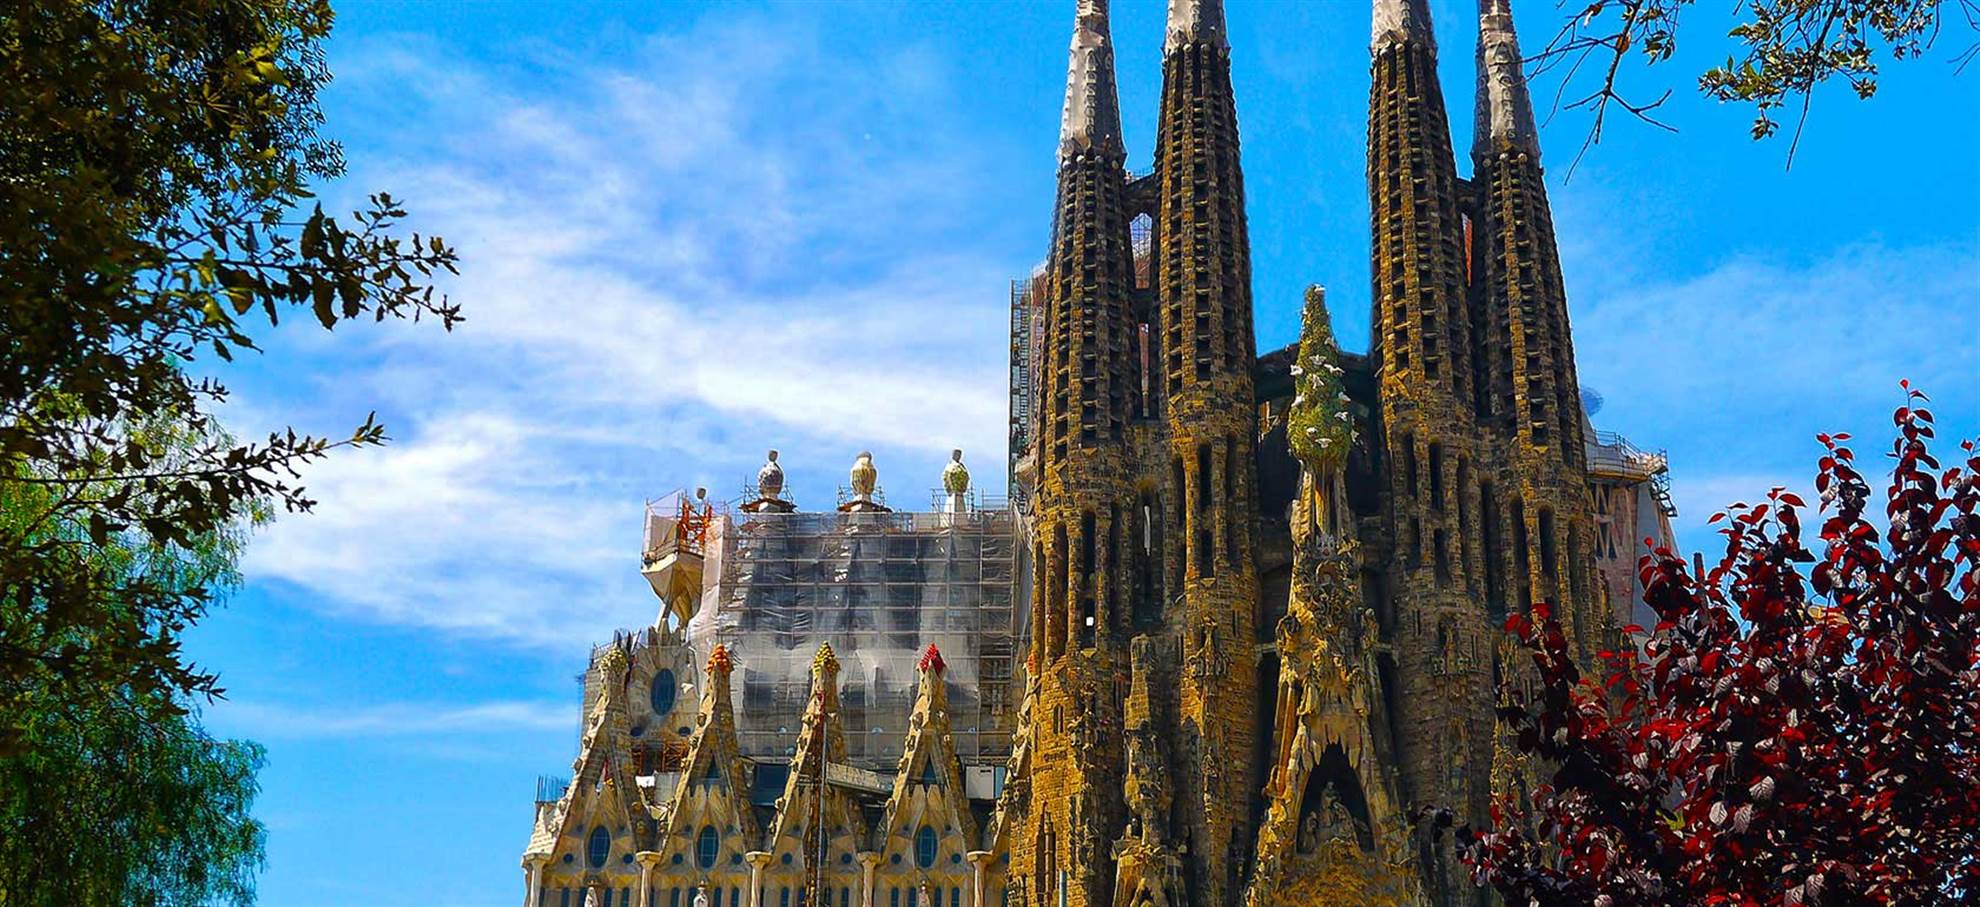 La Sagrada Familia Guided Tour, Skip the line!